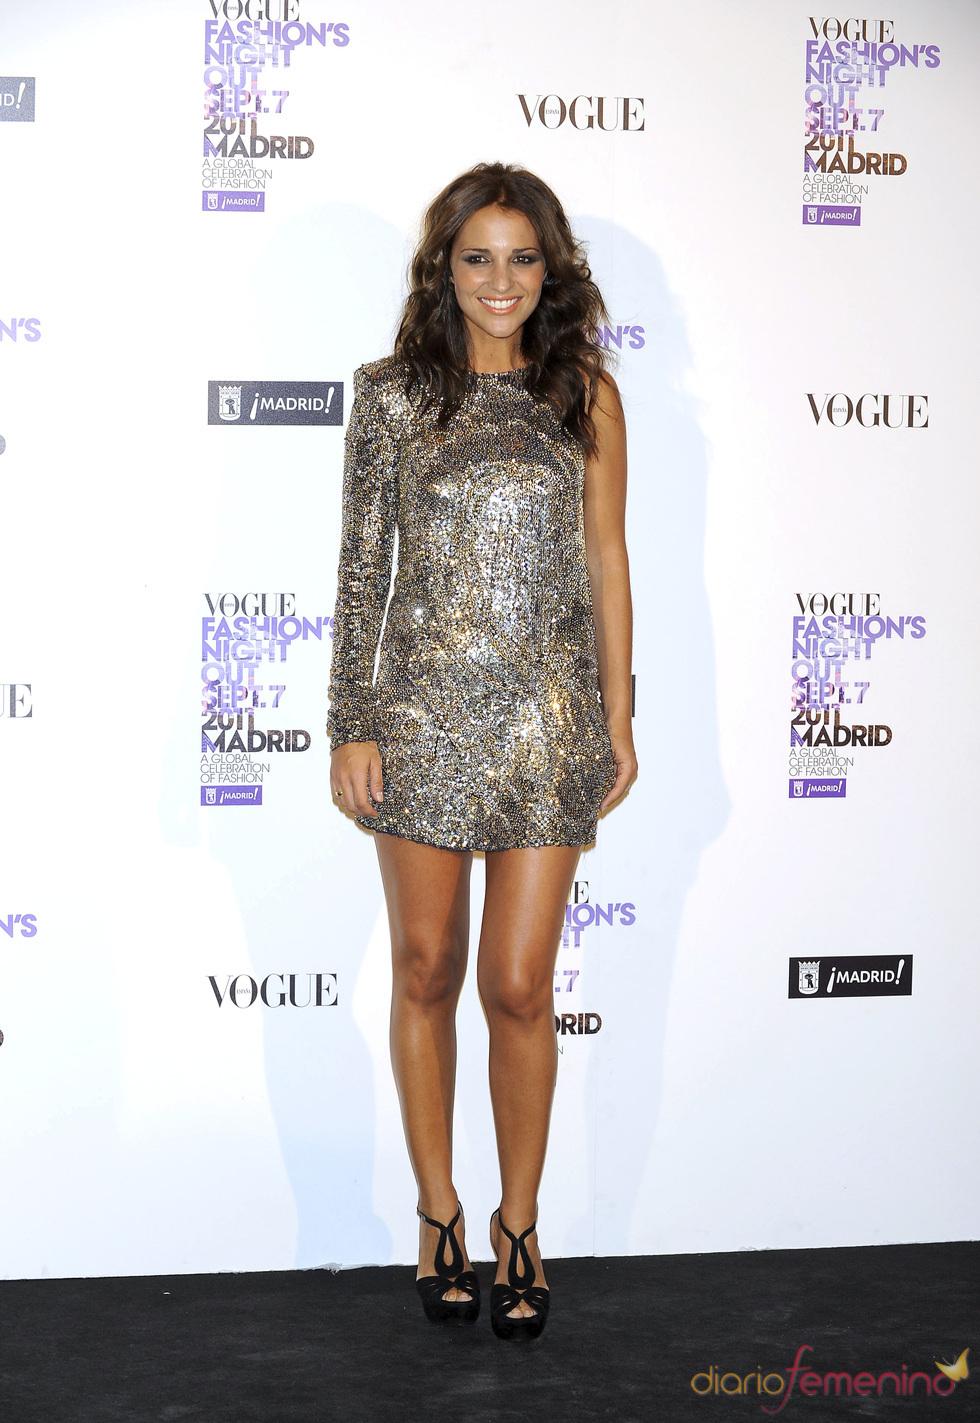 Paula Echevarría durante la Vogue Fashion Night Out Madrid 2011